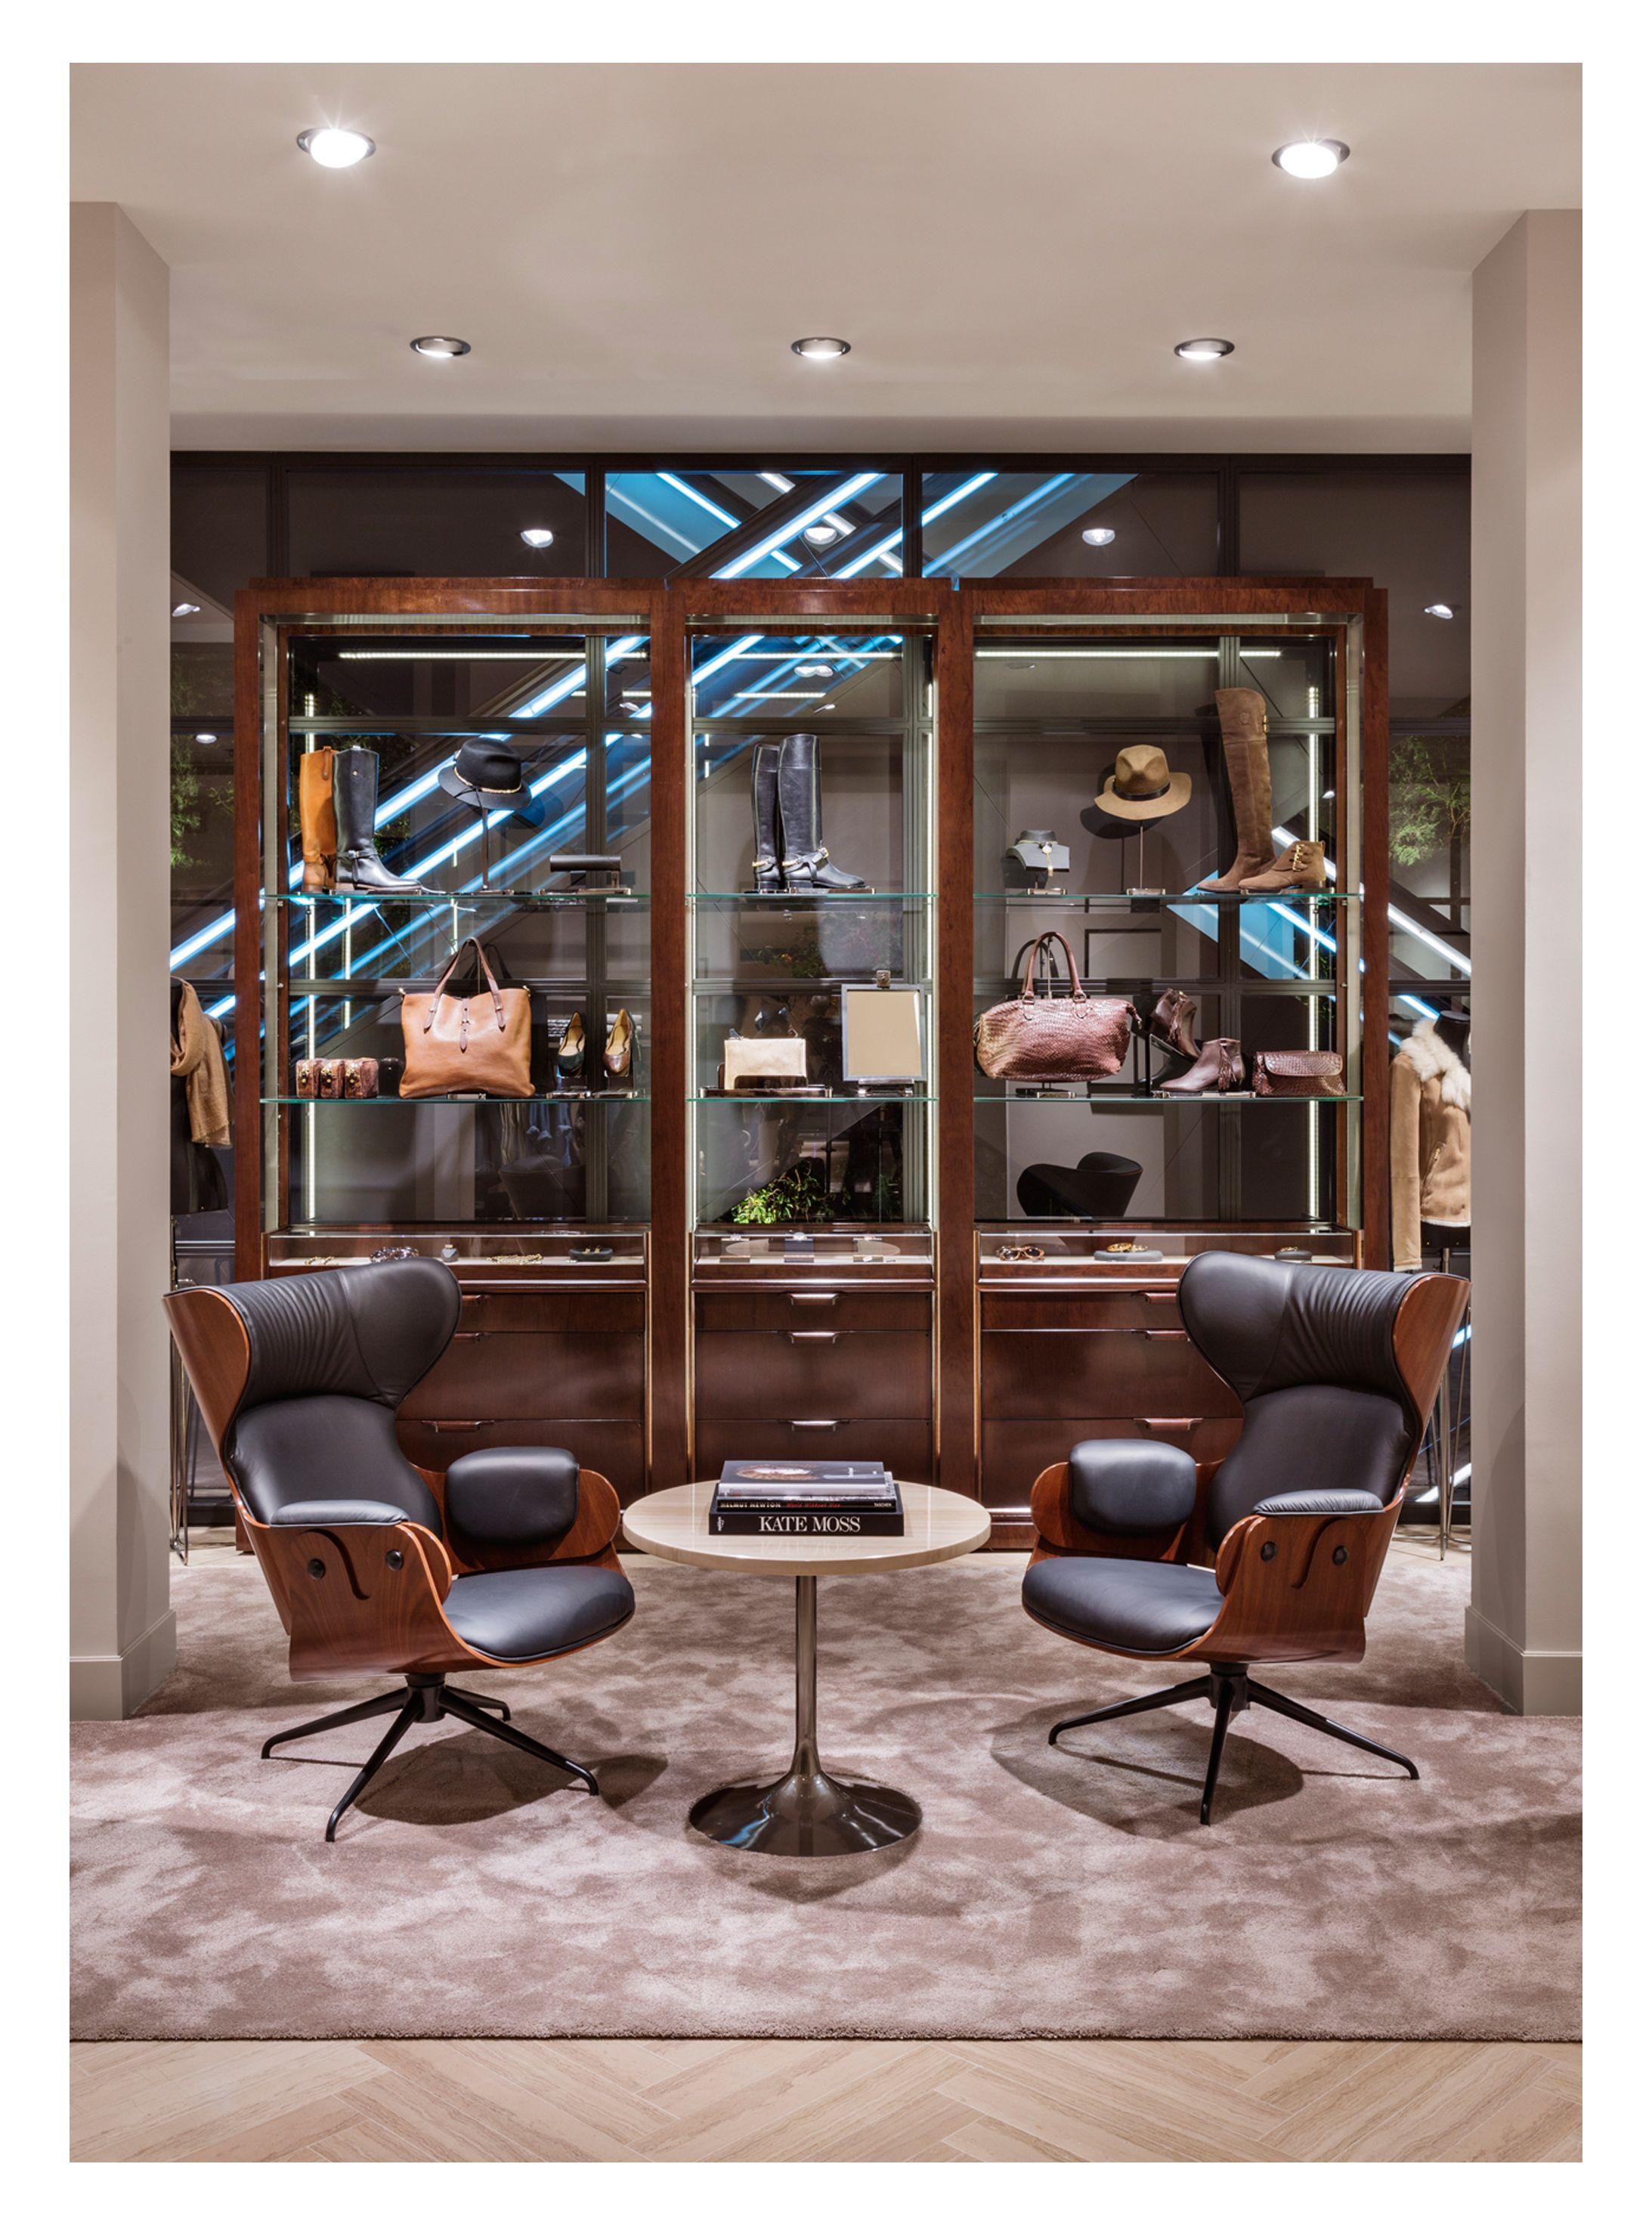 massimo dutti flagship store serrano 48 madrid ground floor women accessories 39 collection. Black Bedroom Furniture Sets. Home Design Ideas